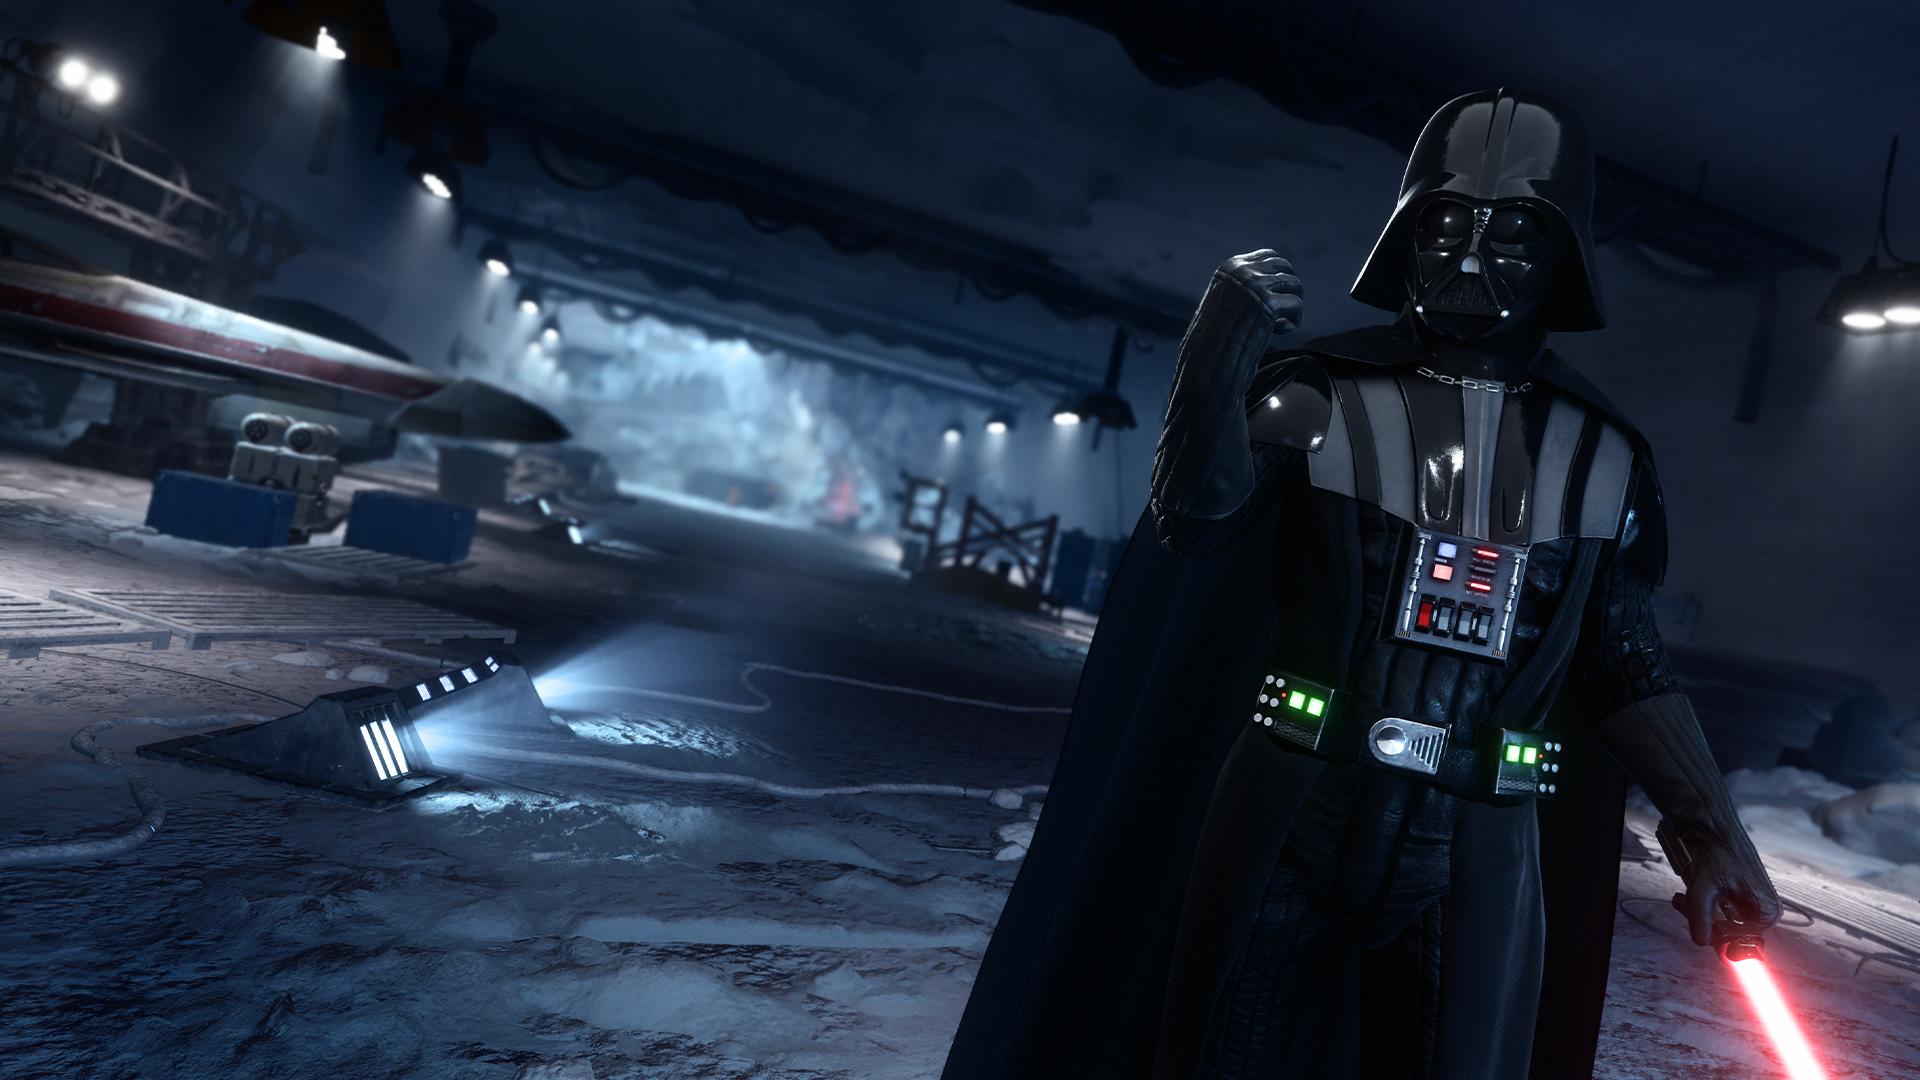 Star Wars Battlefront The Dark Side Wallpaper By Faithfullfaun1